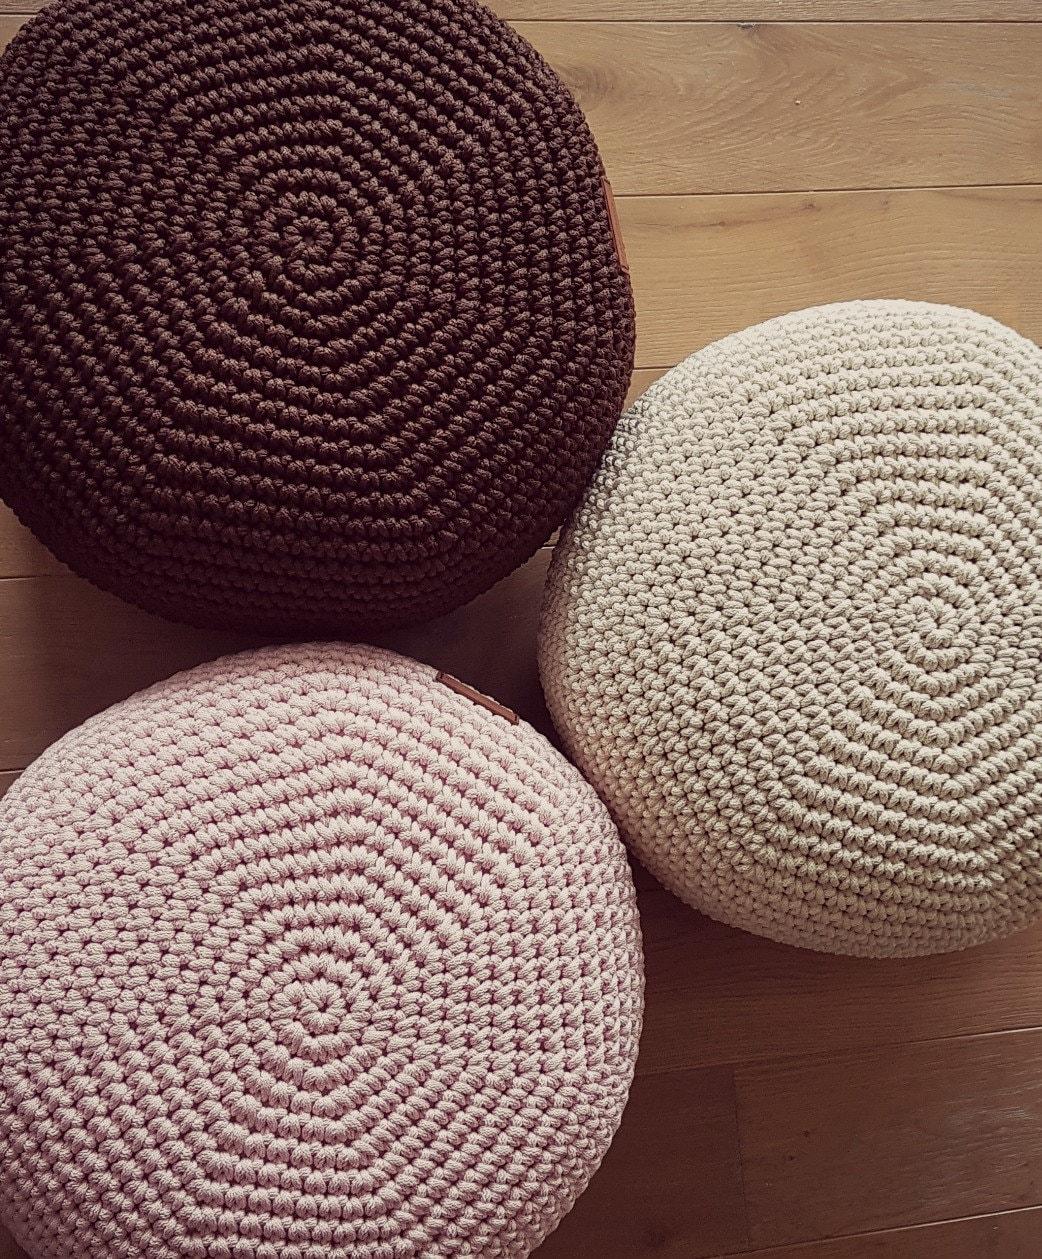 tr s joli b b rose pouf 16 39 39 pour b b chambre pouf etsy. Black Bedroom Furniture Sets. Home Design Ideas